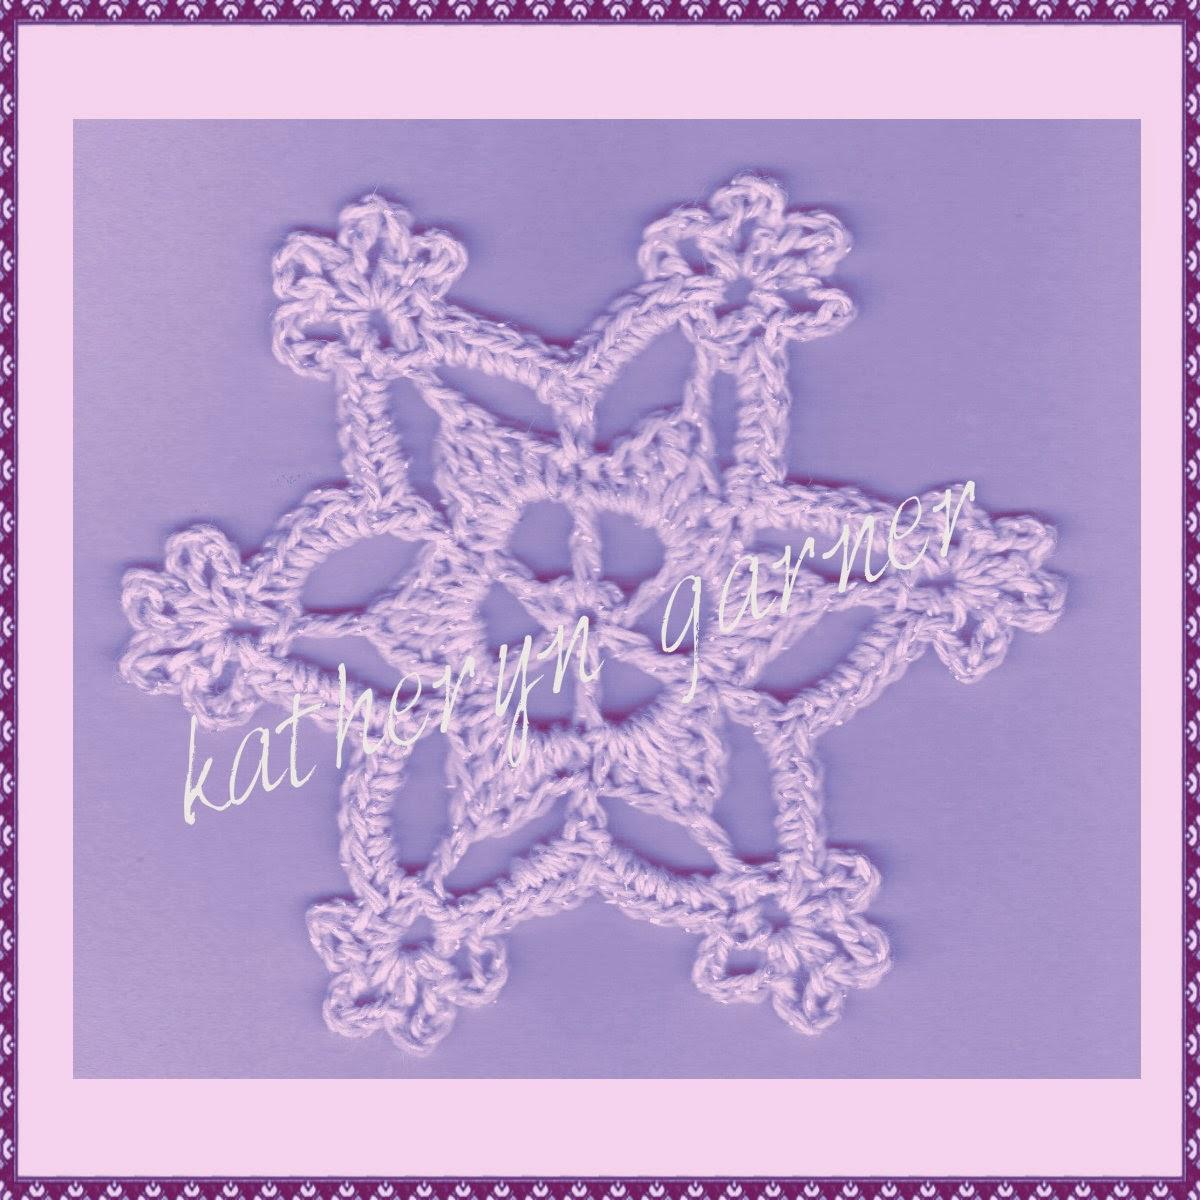 Crochet Snowflake Patterns For Beginners : THREAD N STITCHES: BEGINNER SNOWFLAKE